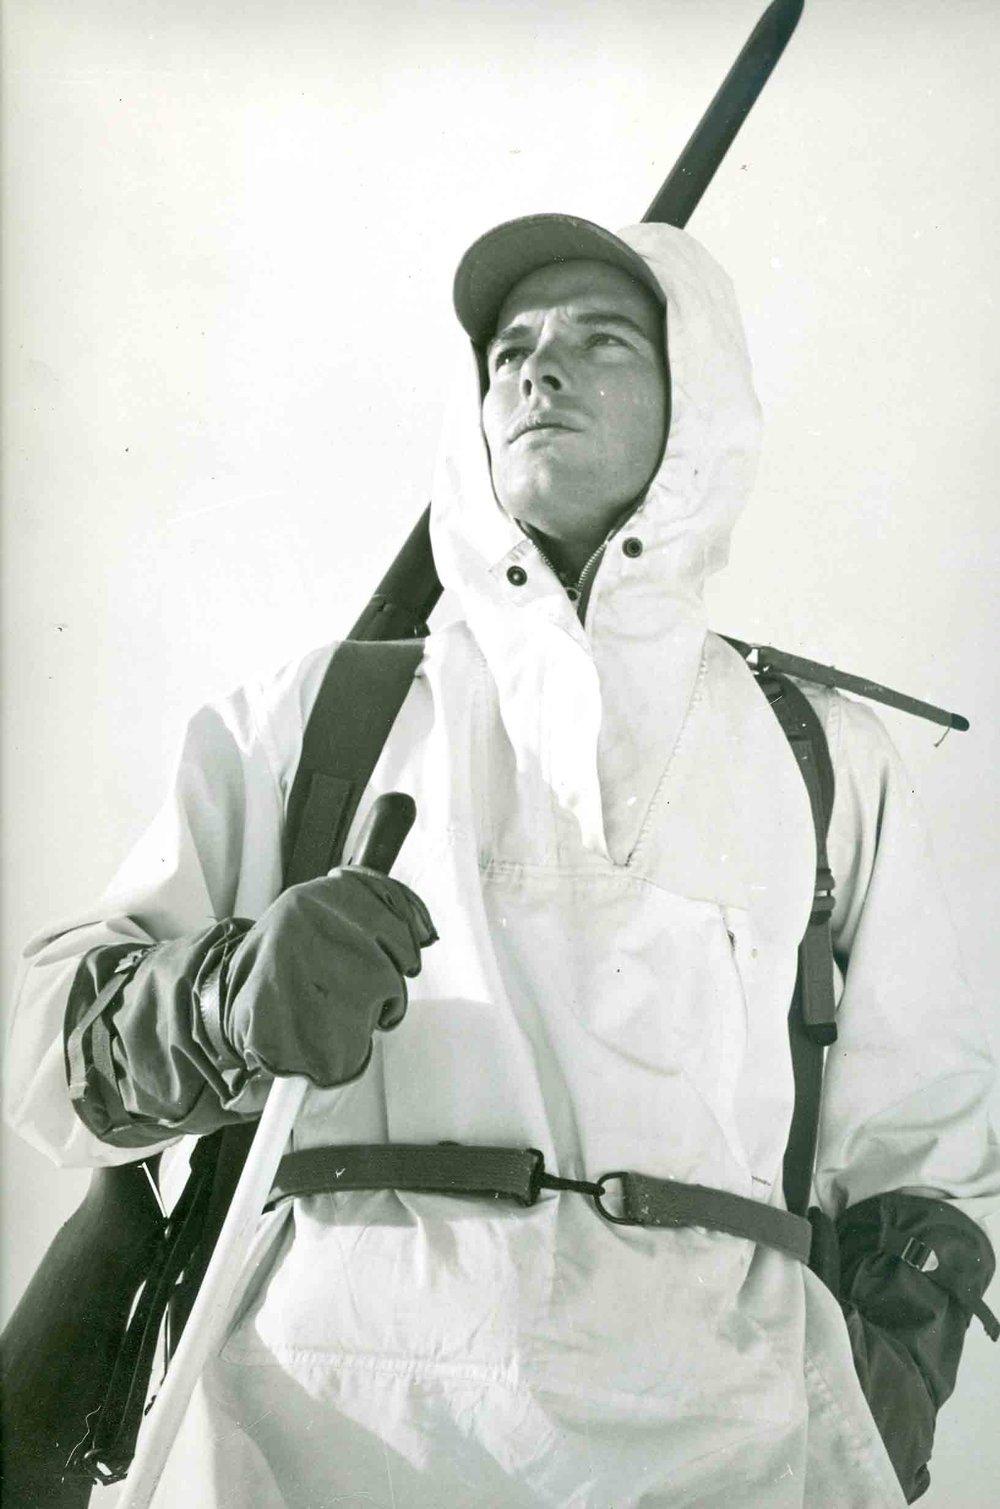 10th Mtn Trooper - from Ski Down The Years.jpg